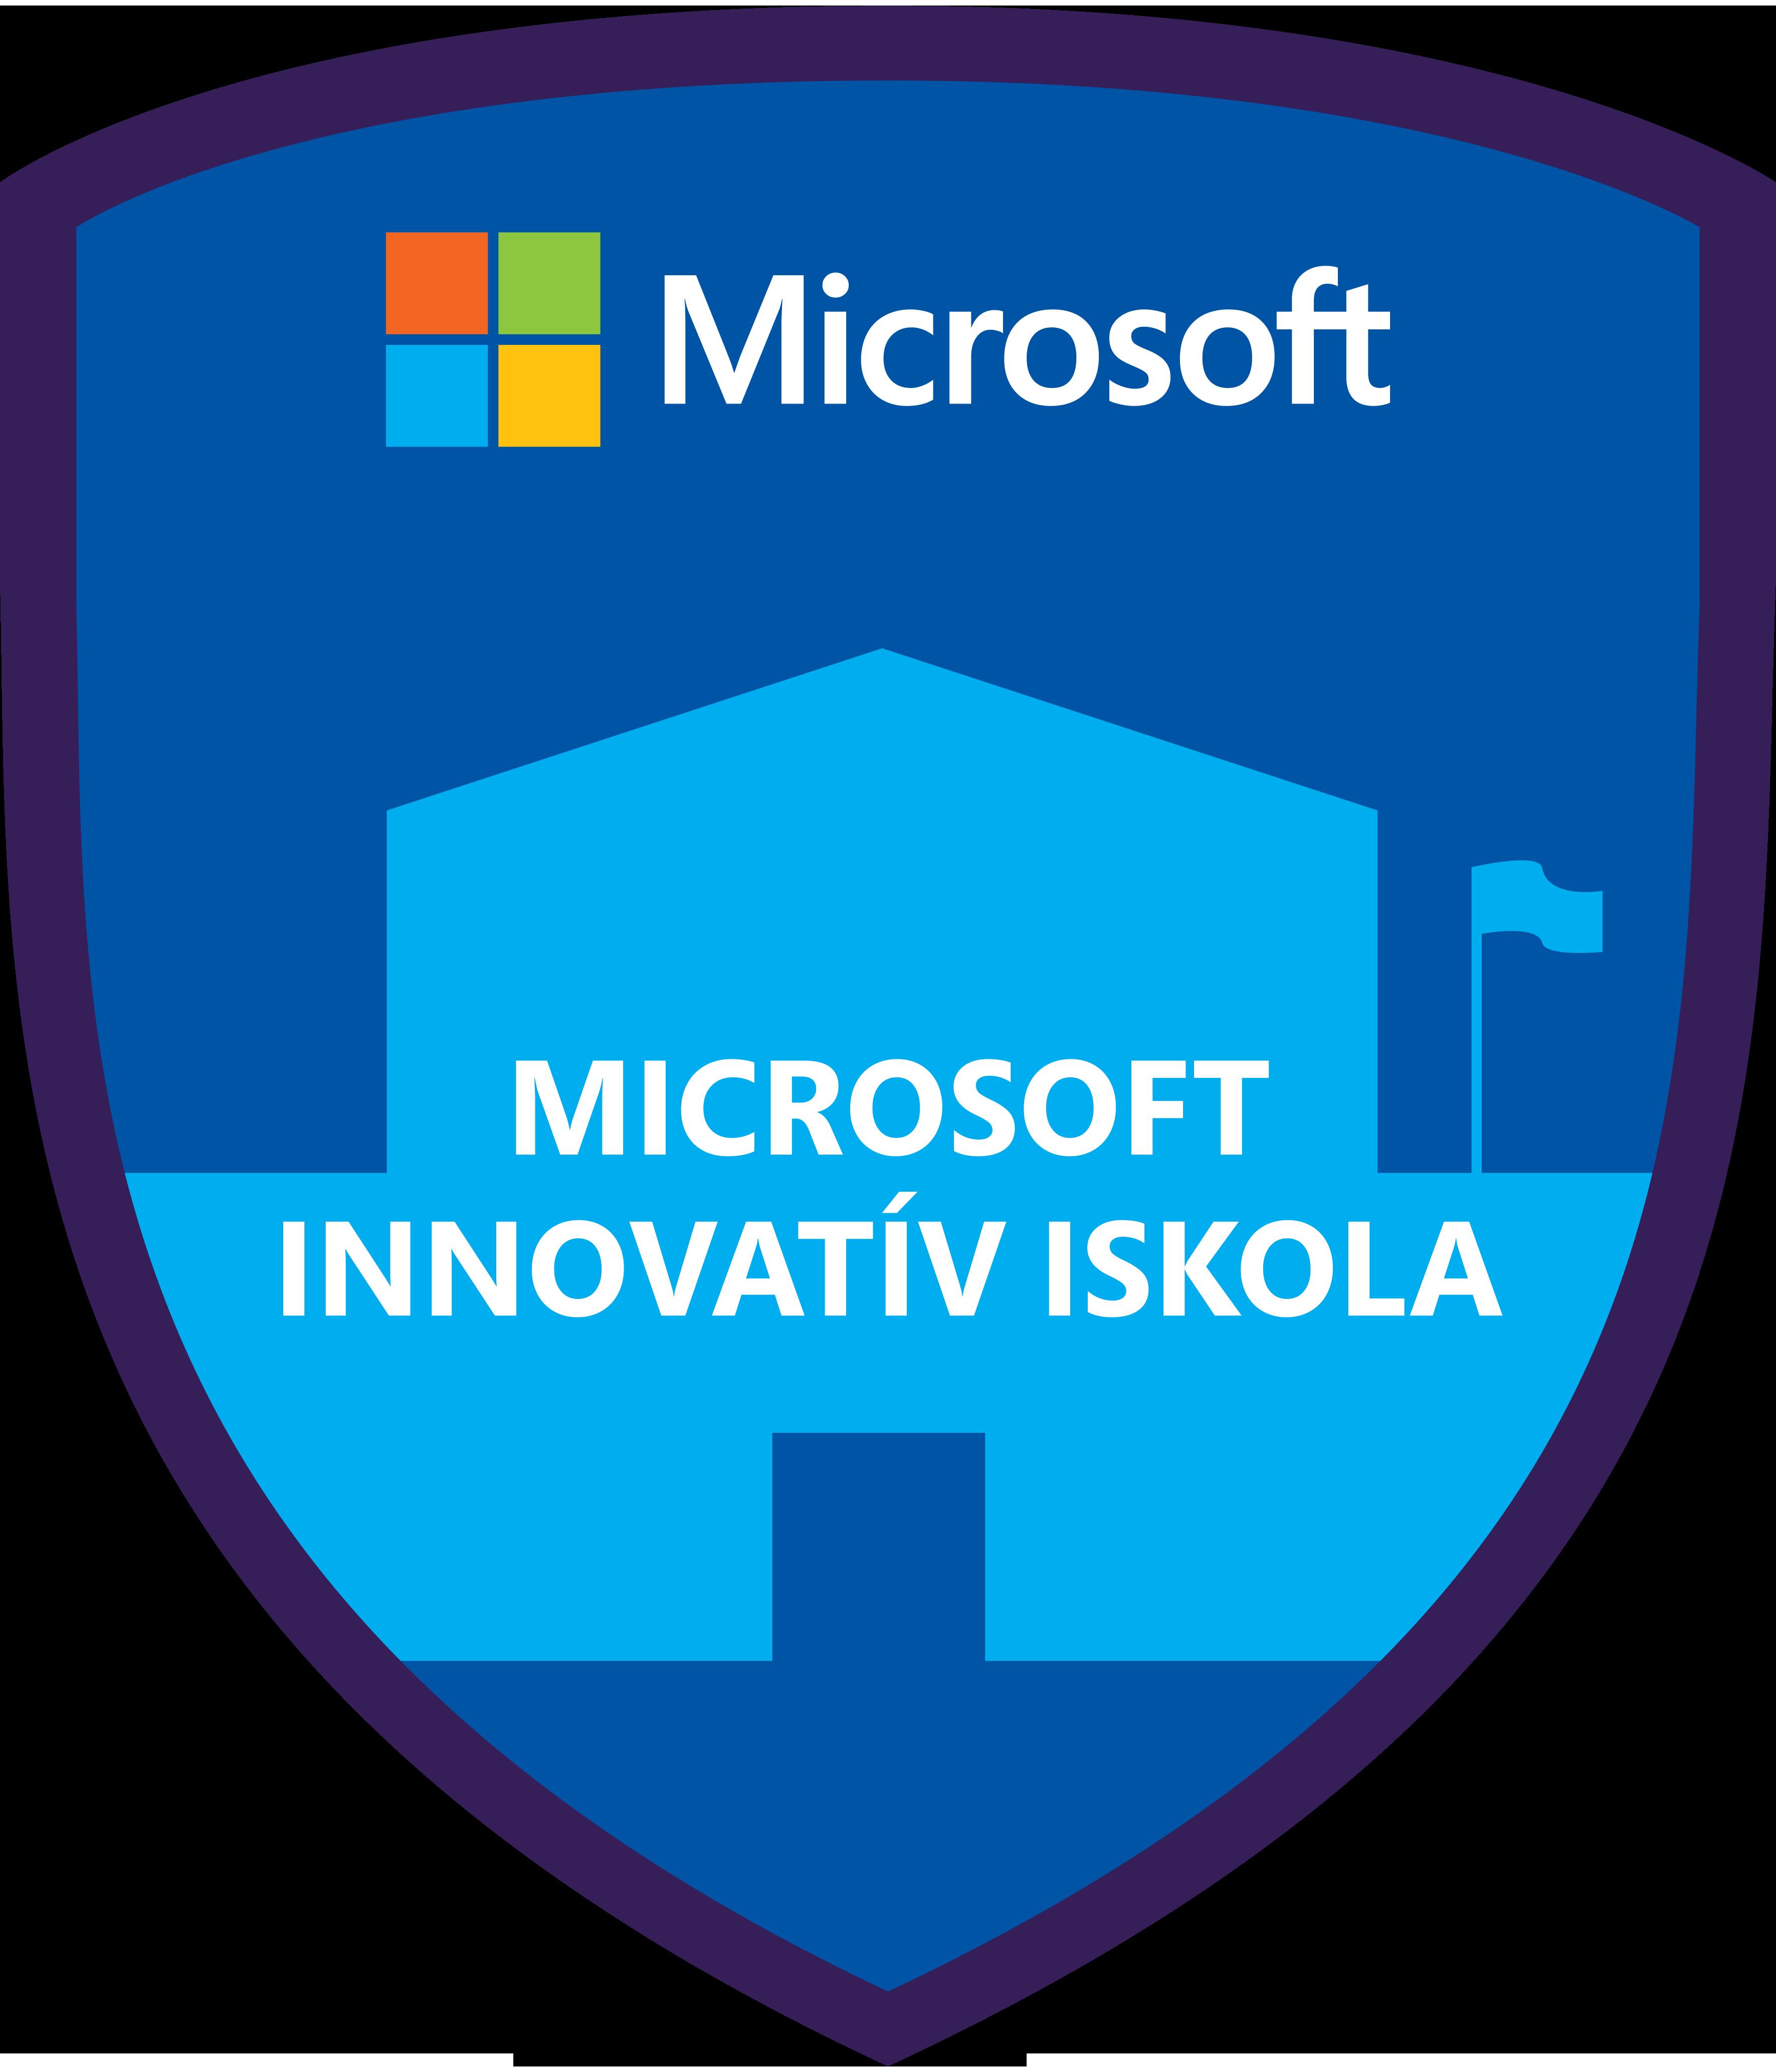 Microsoft Innovatív Iskola lettünk